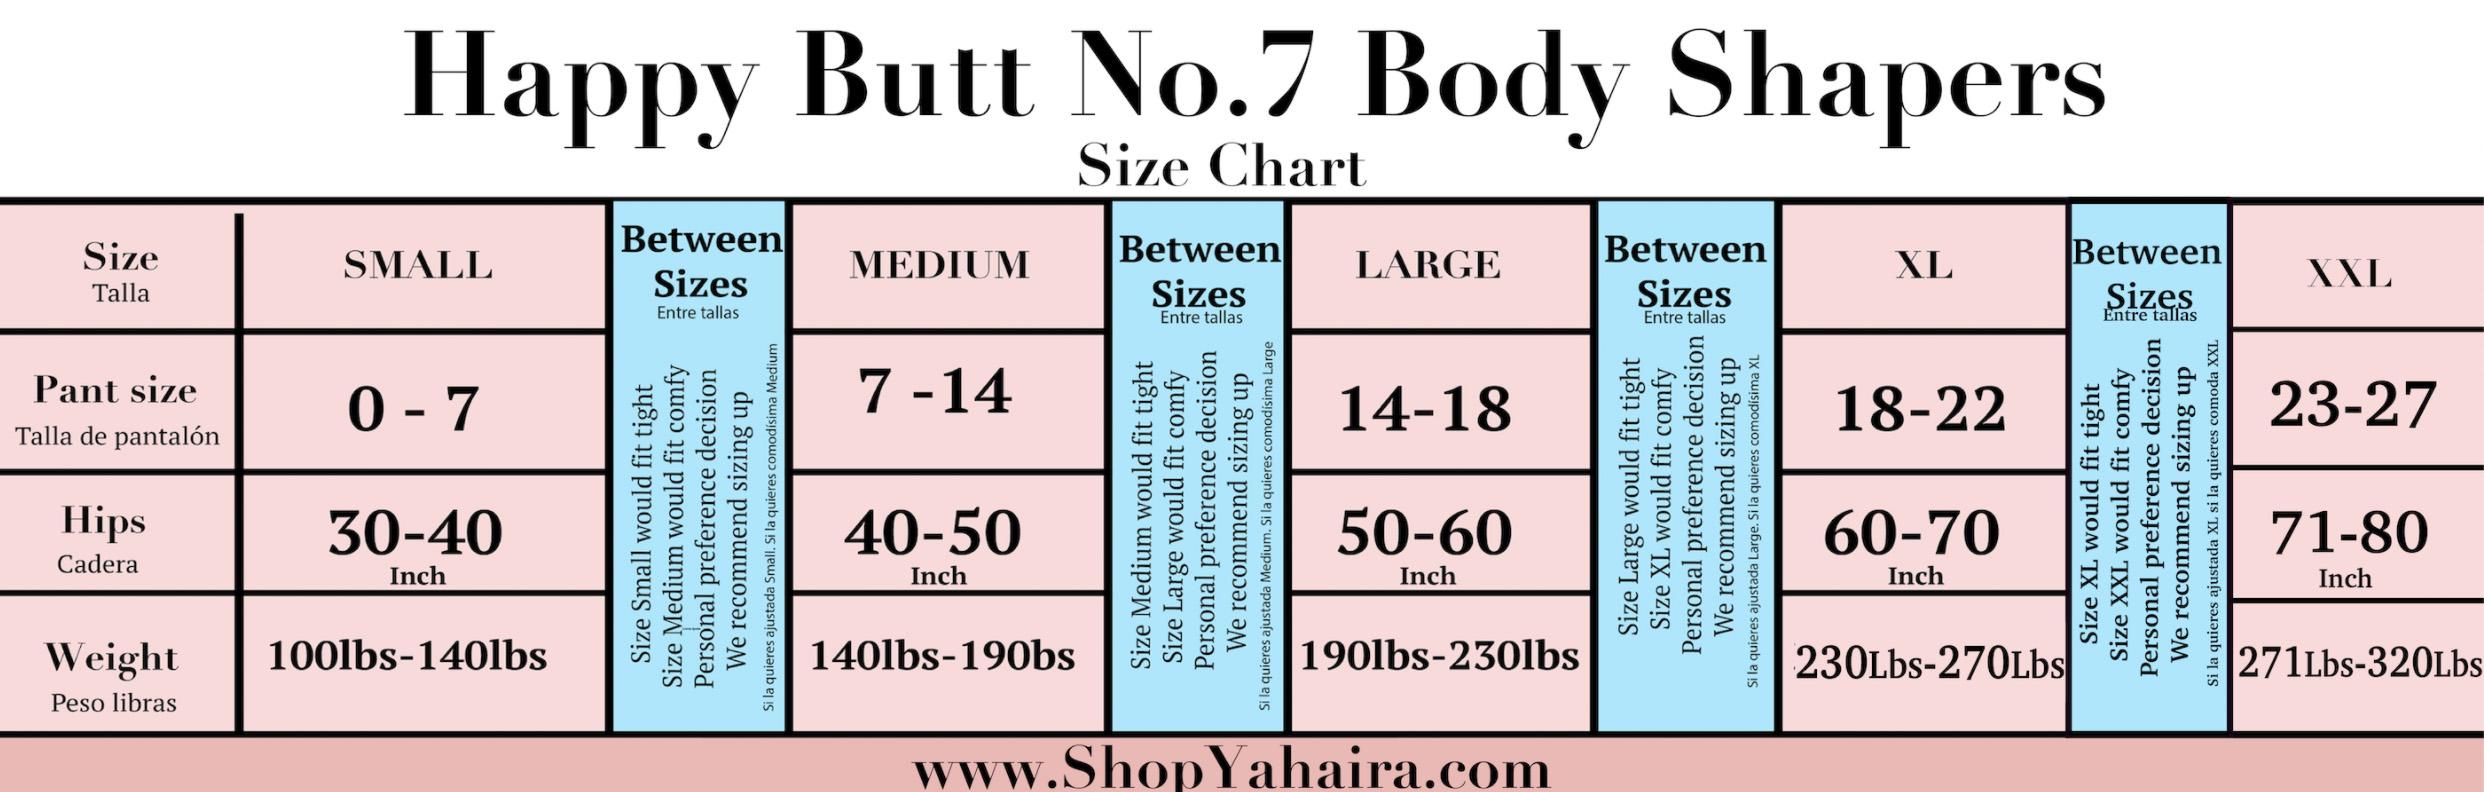 size-chart-xxl-happy-2021-may.jpg